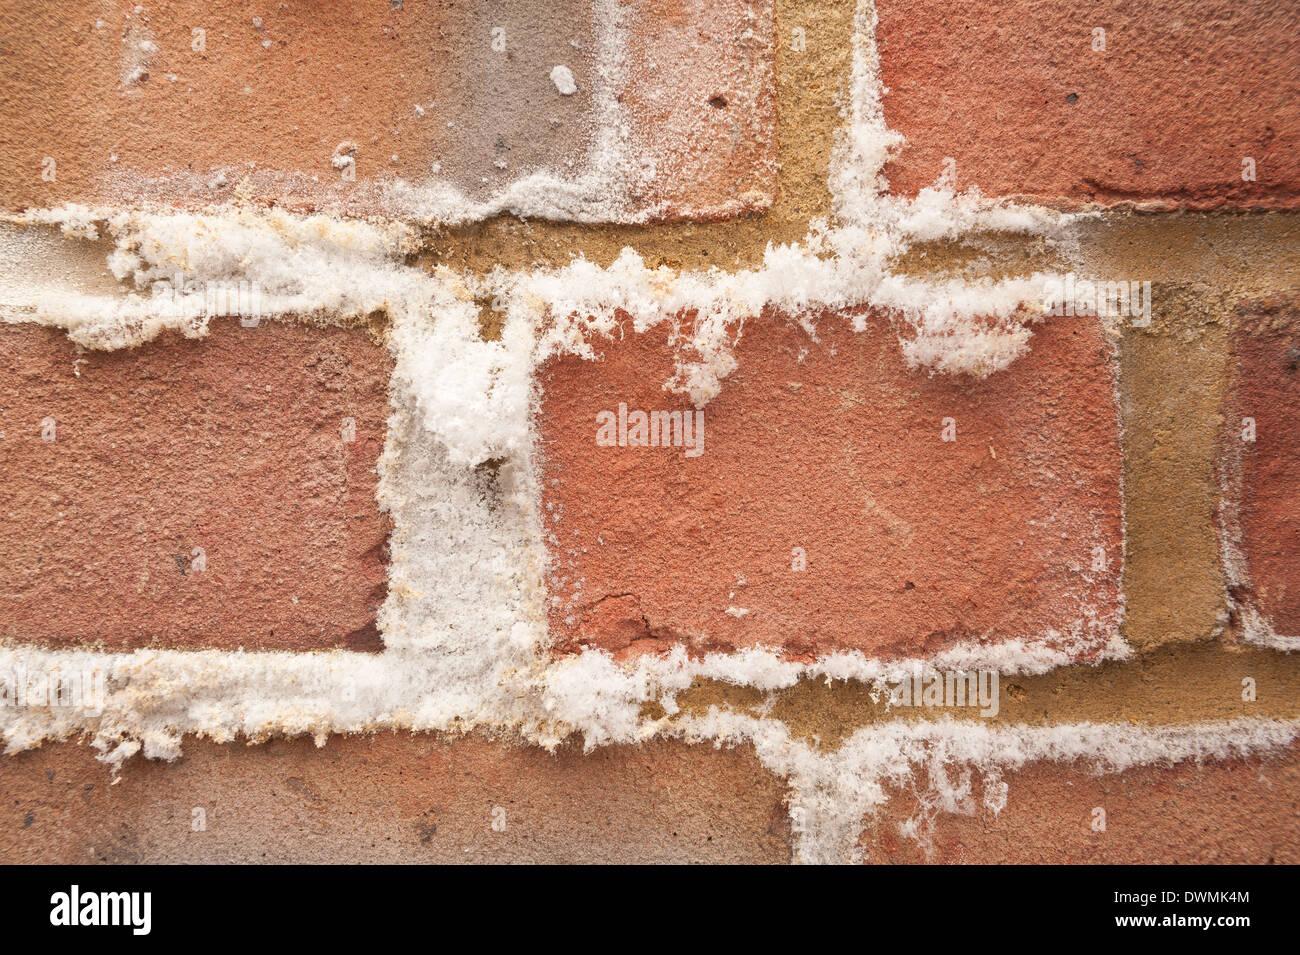 Efflorescence A Powdery White Salty Deposit Of Salts That